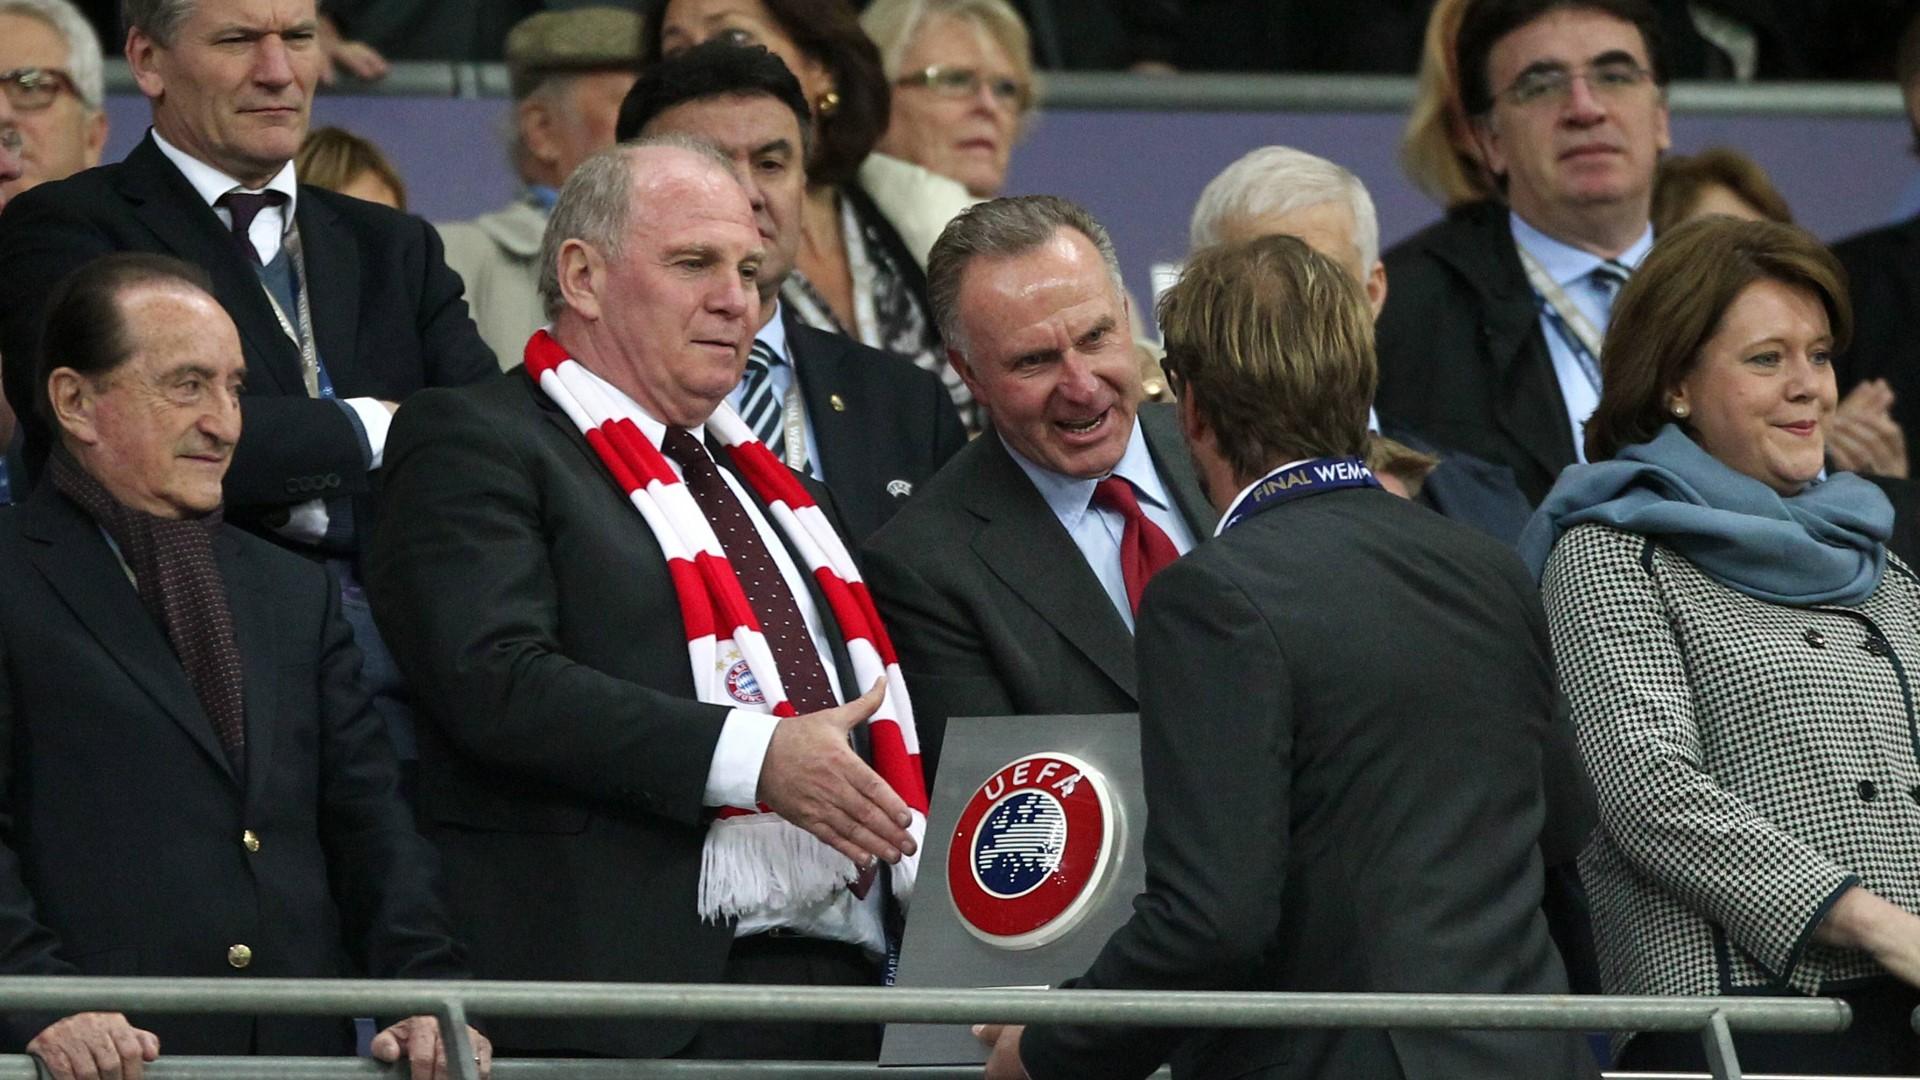 Premier League im Liveticker: Manchester City trifft auf Meister FC Liverpool